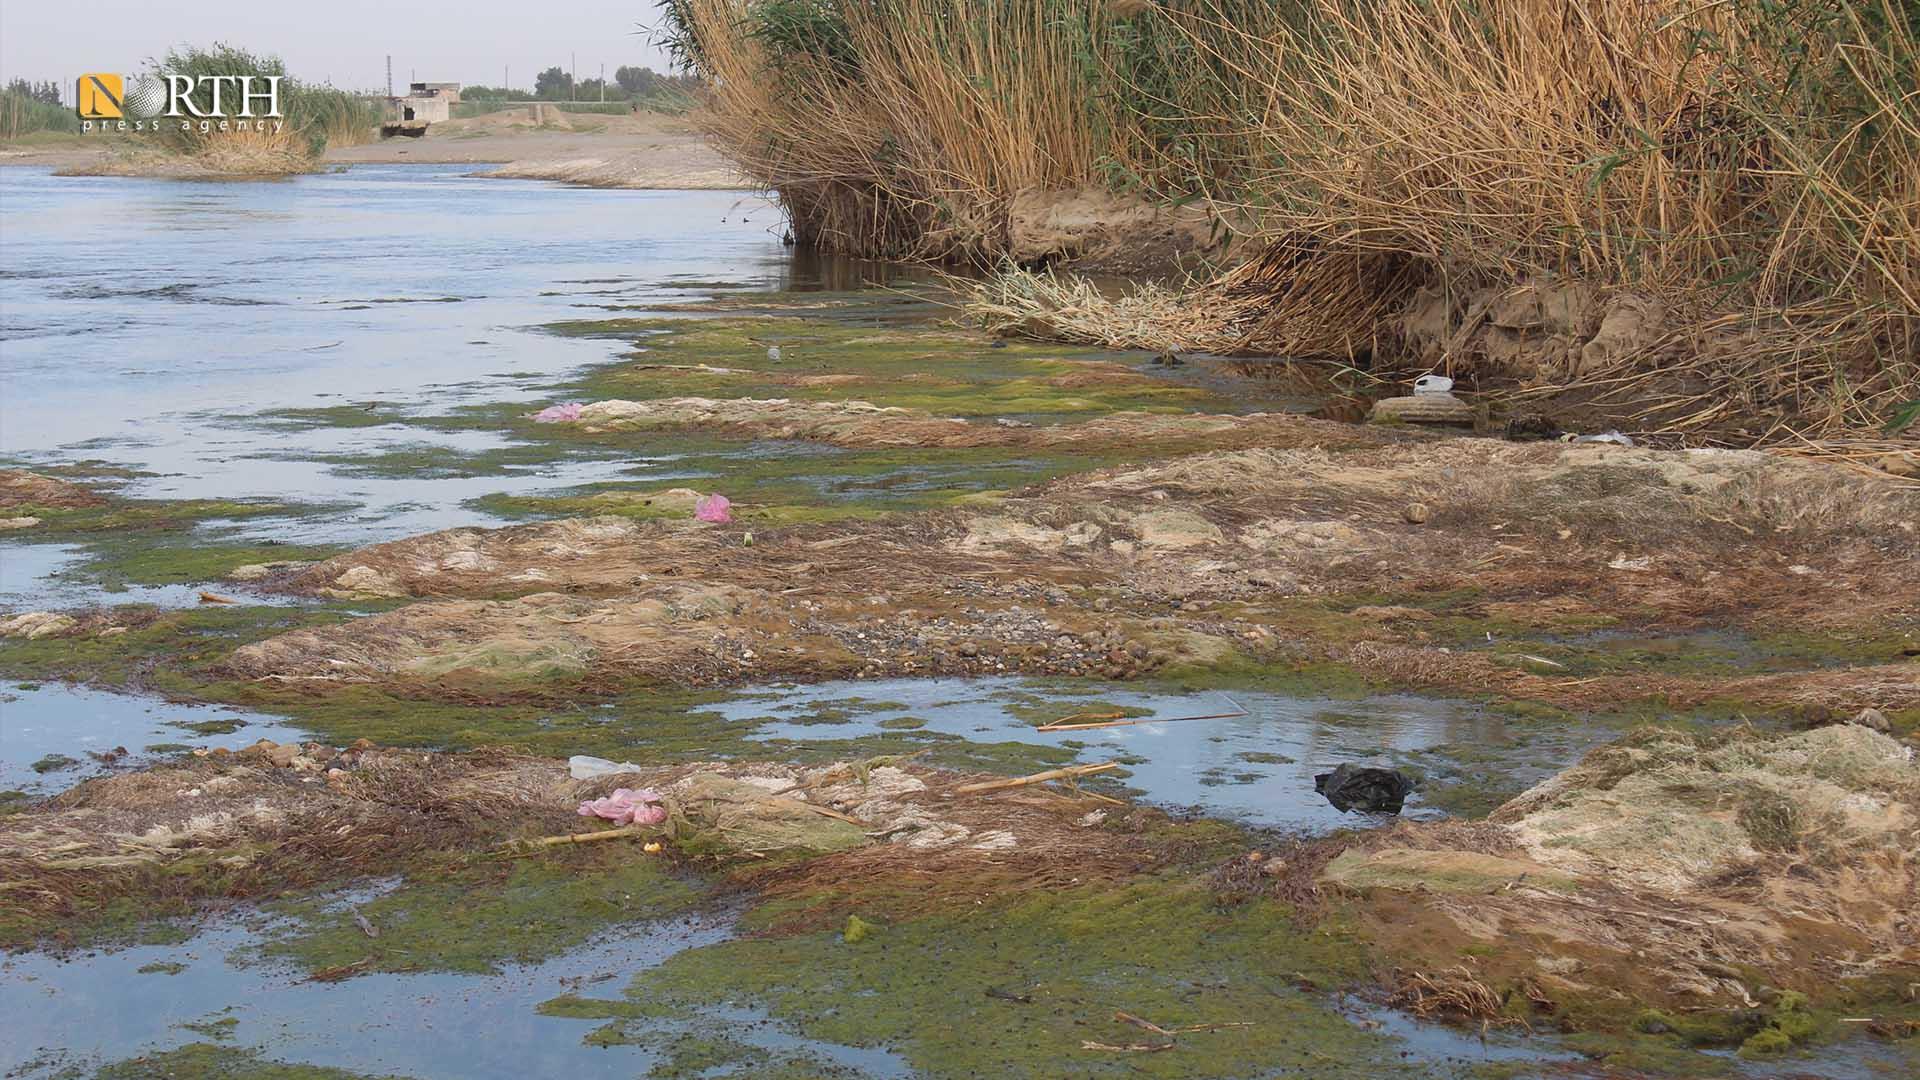 River algae have become outside the course of the Euphrates River near Raqqa - North Press